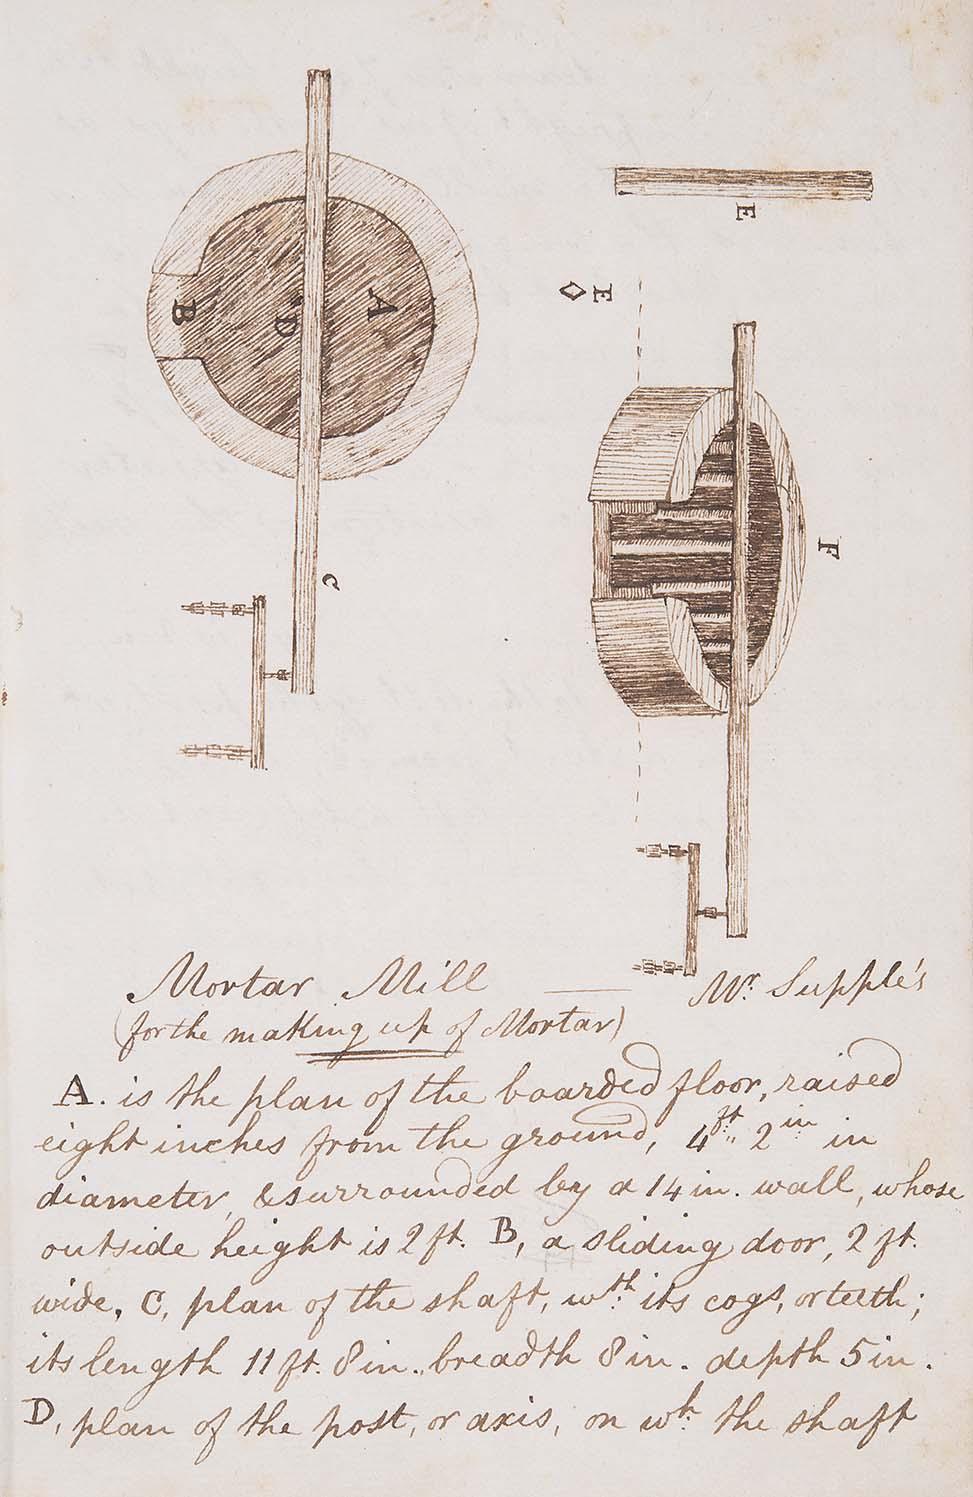 Details from Helenus Scott's receipt notebook, 1820s, MLMSS 38/10